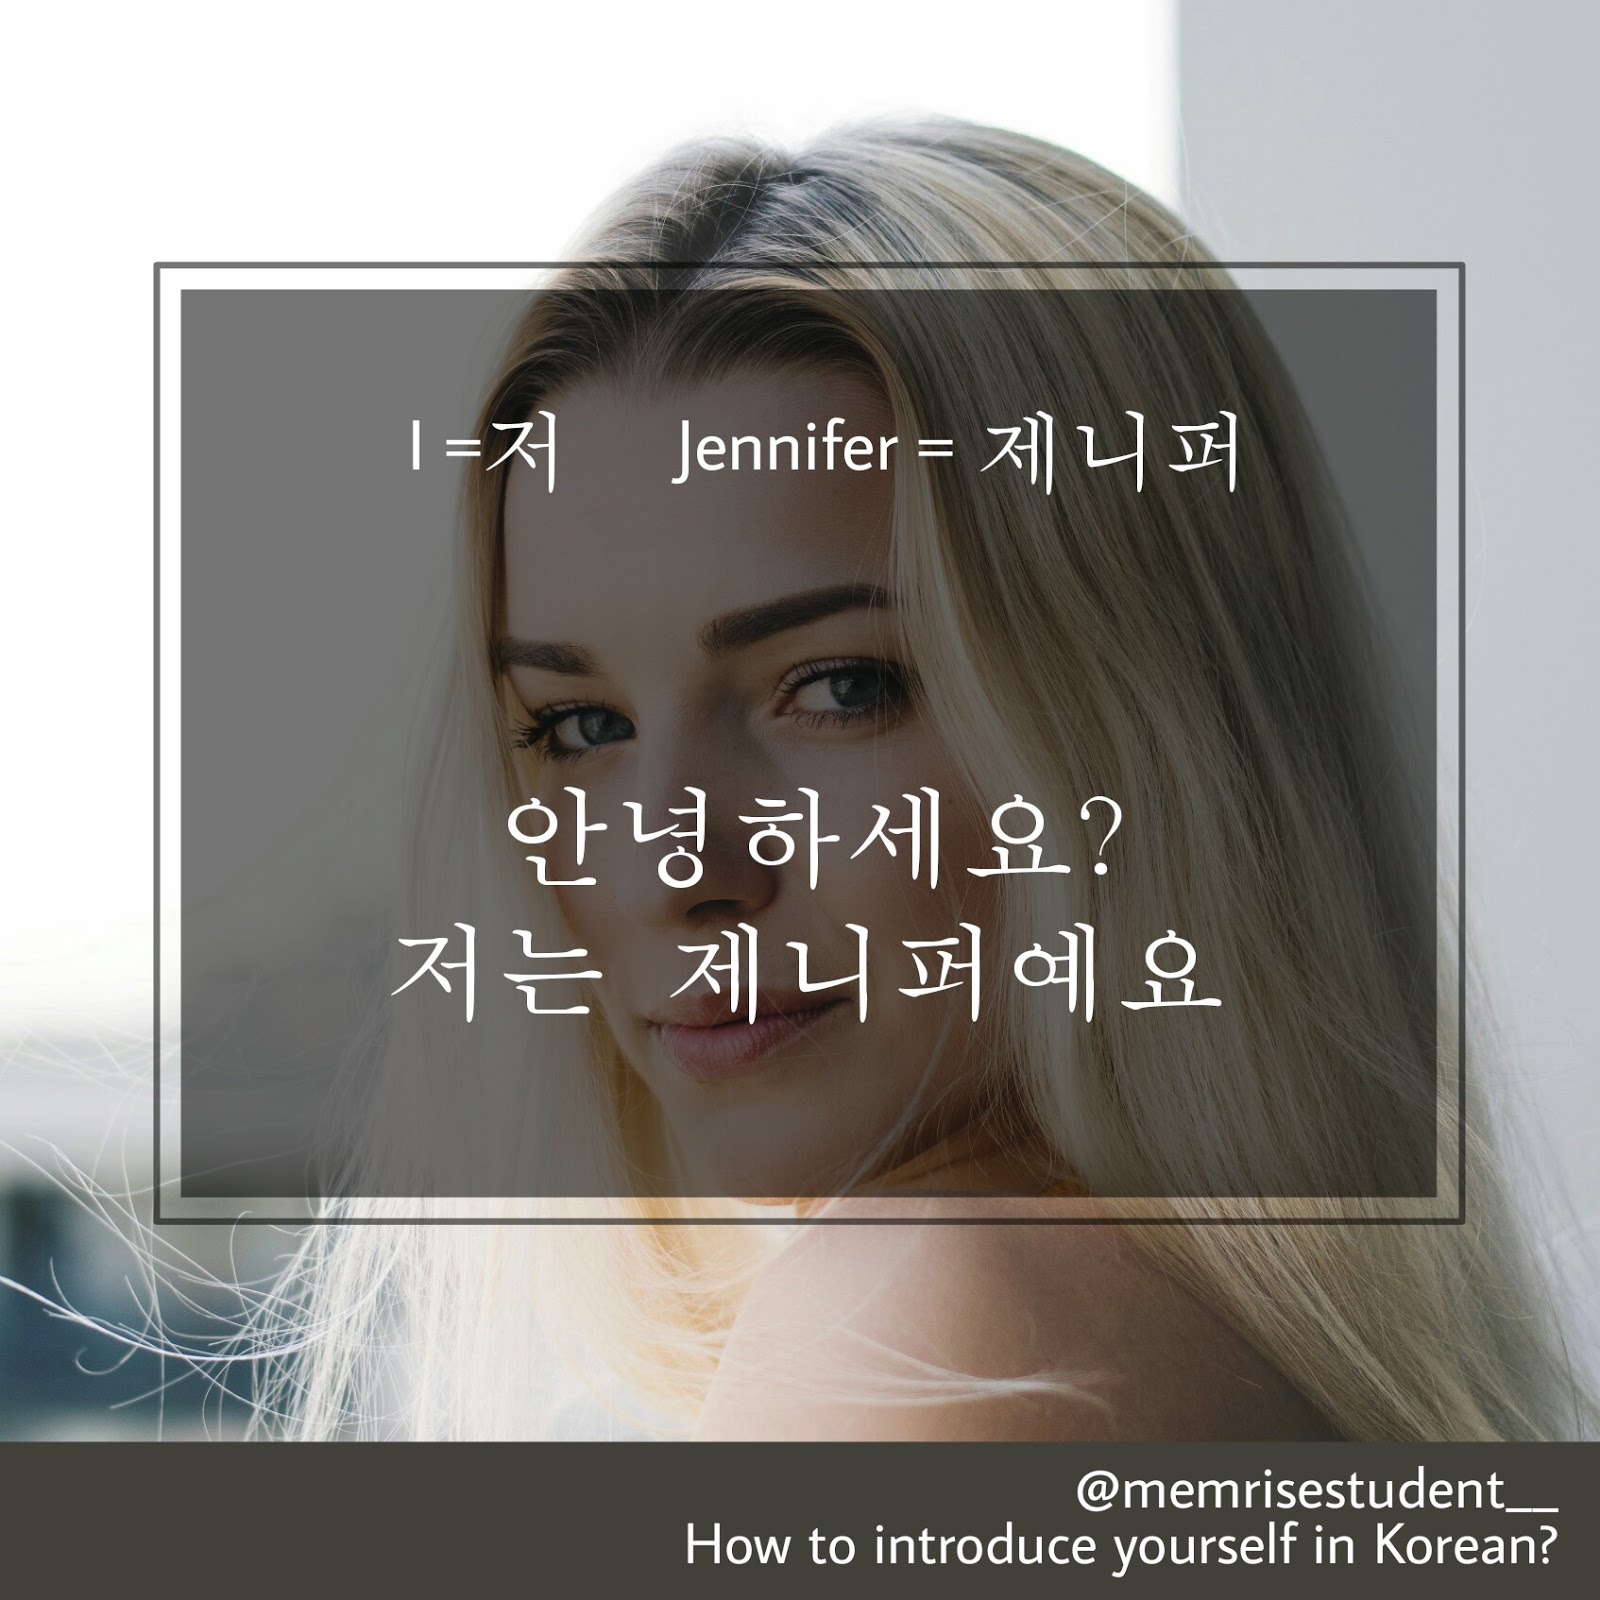 Working in the Korean language